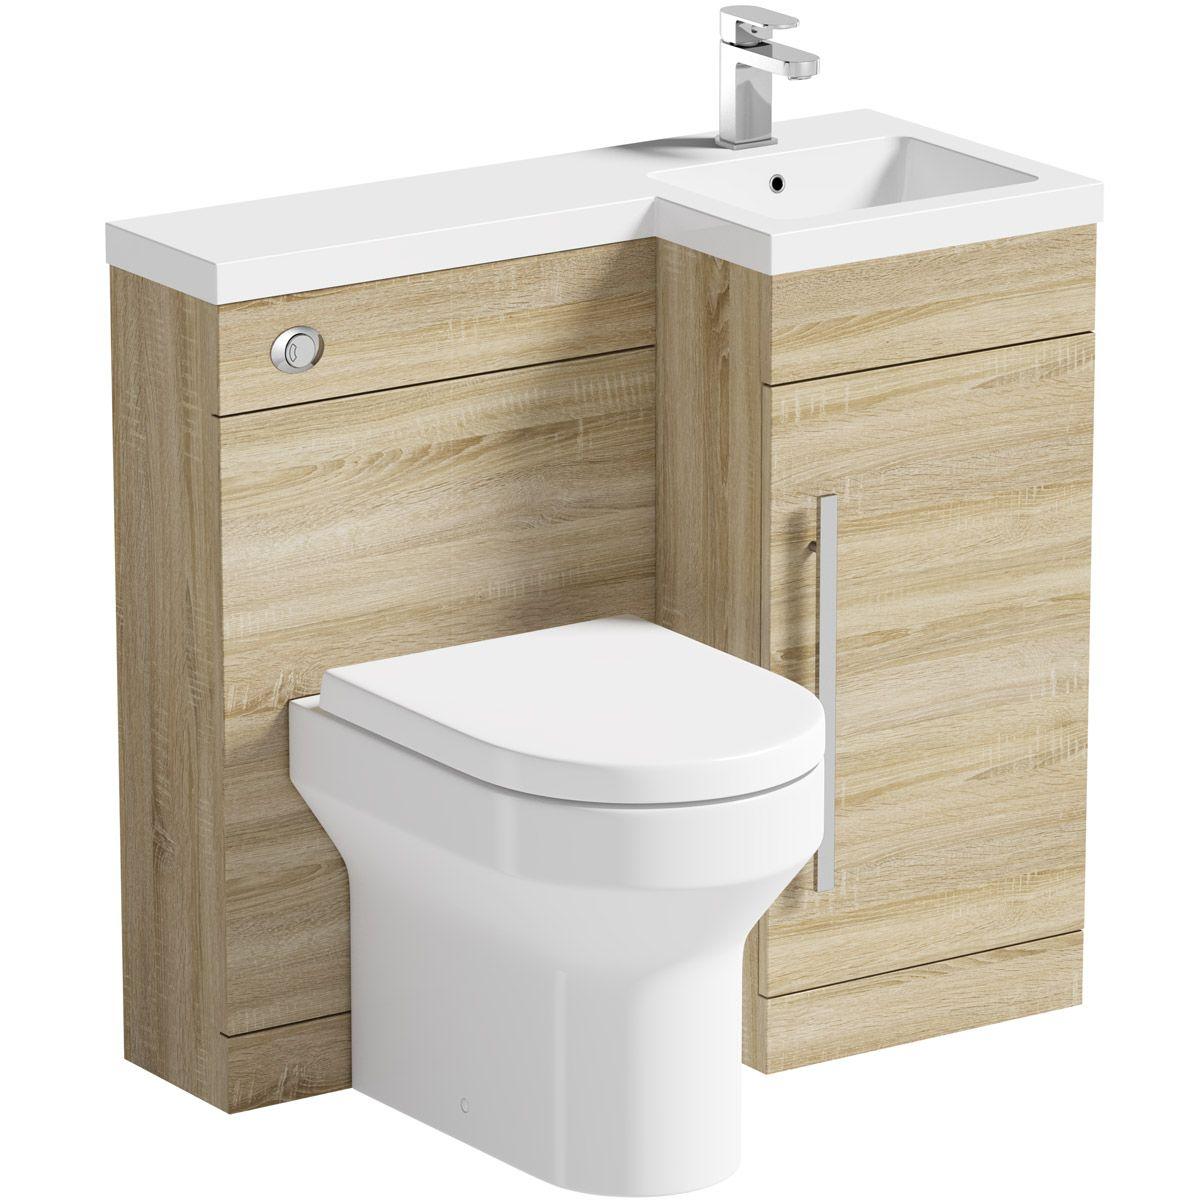 Toilet And Sink Bathroom Combination Units Victoriaplum Com ...